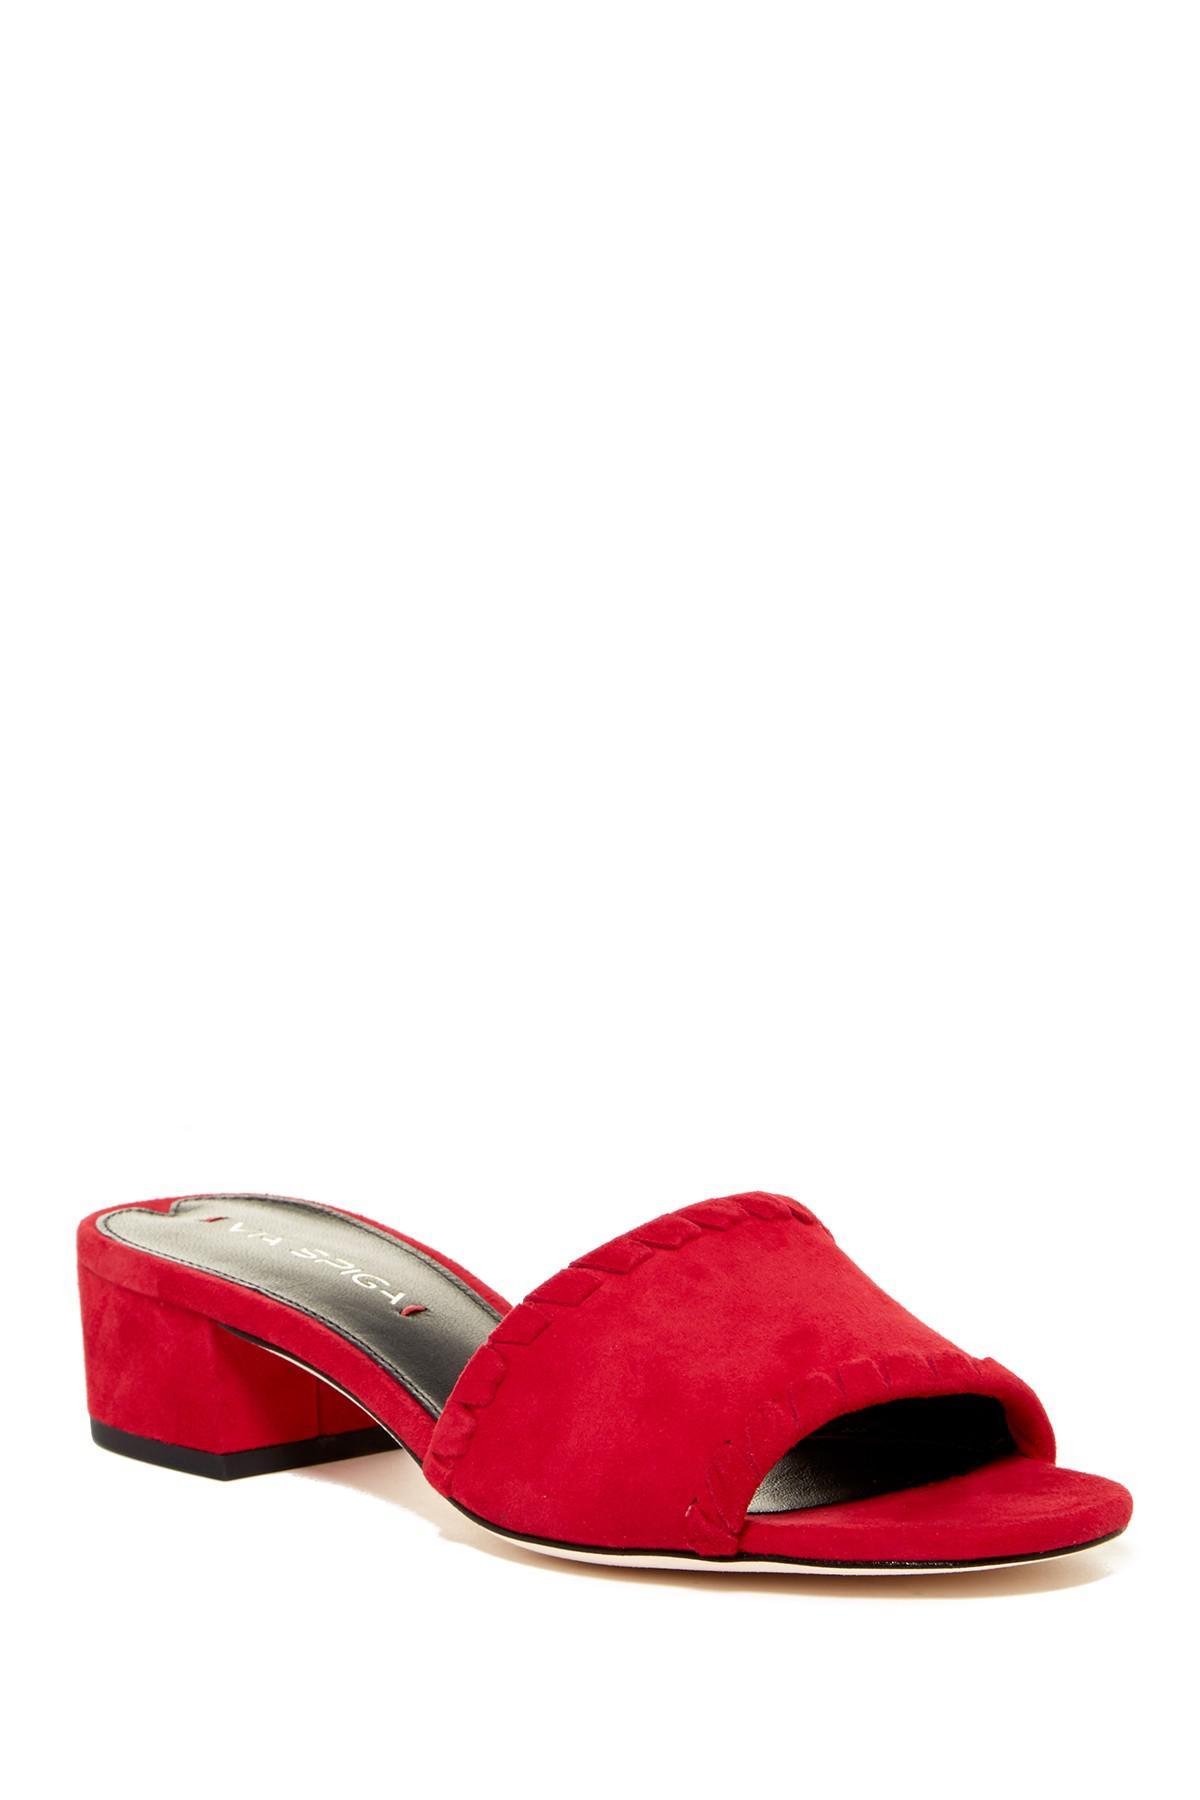 Via Spiga Gwendolyn Block Heel Side Sandal pECoELt21G